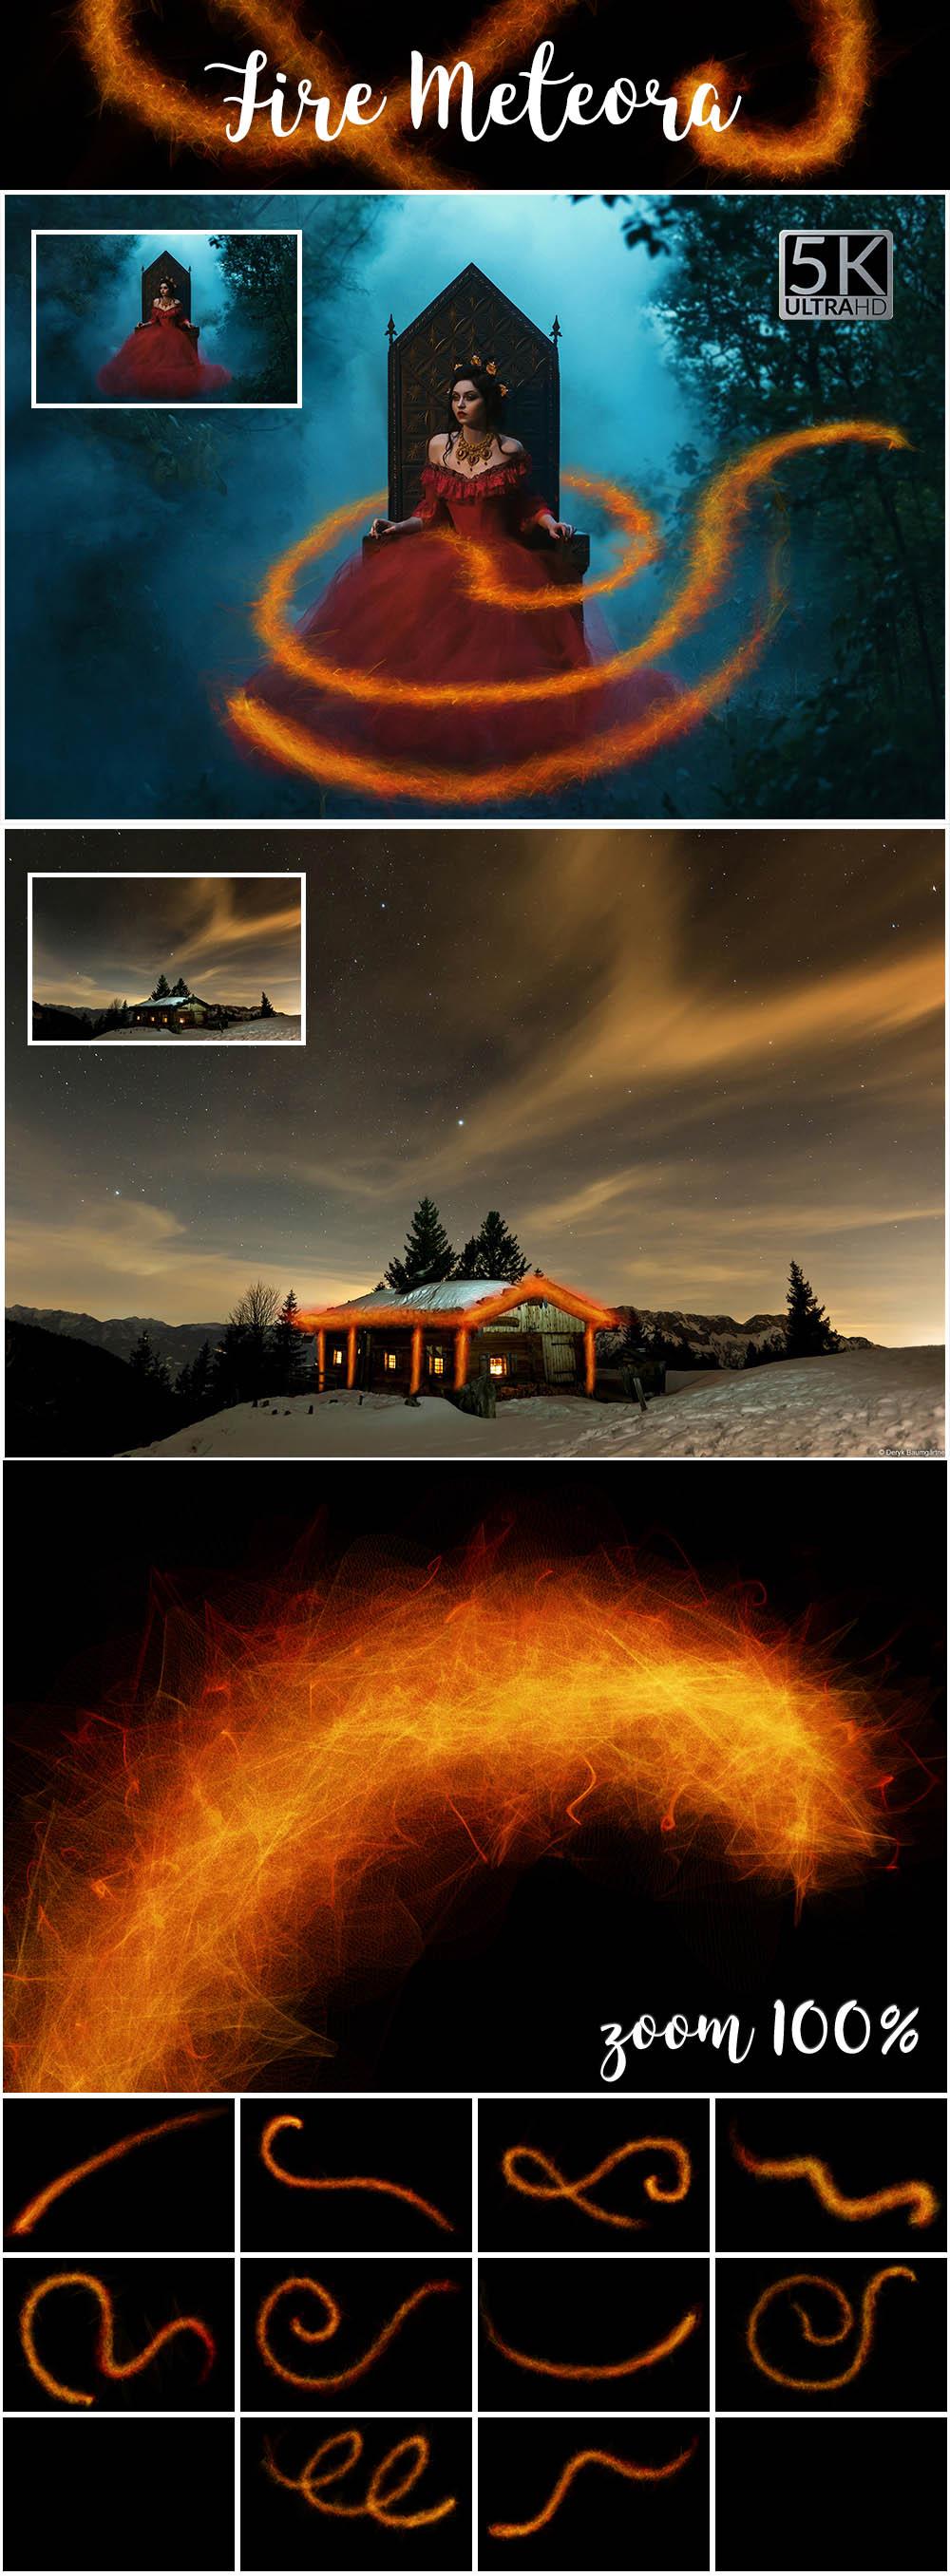 29 - Fire Meteora